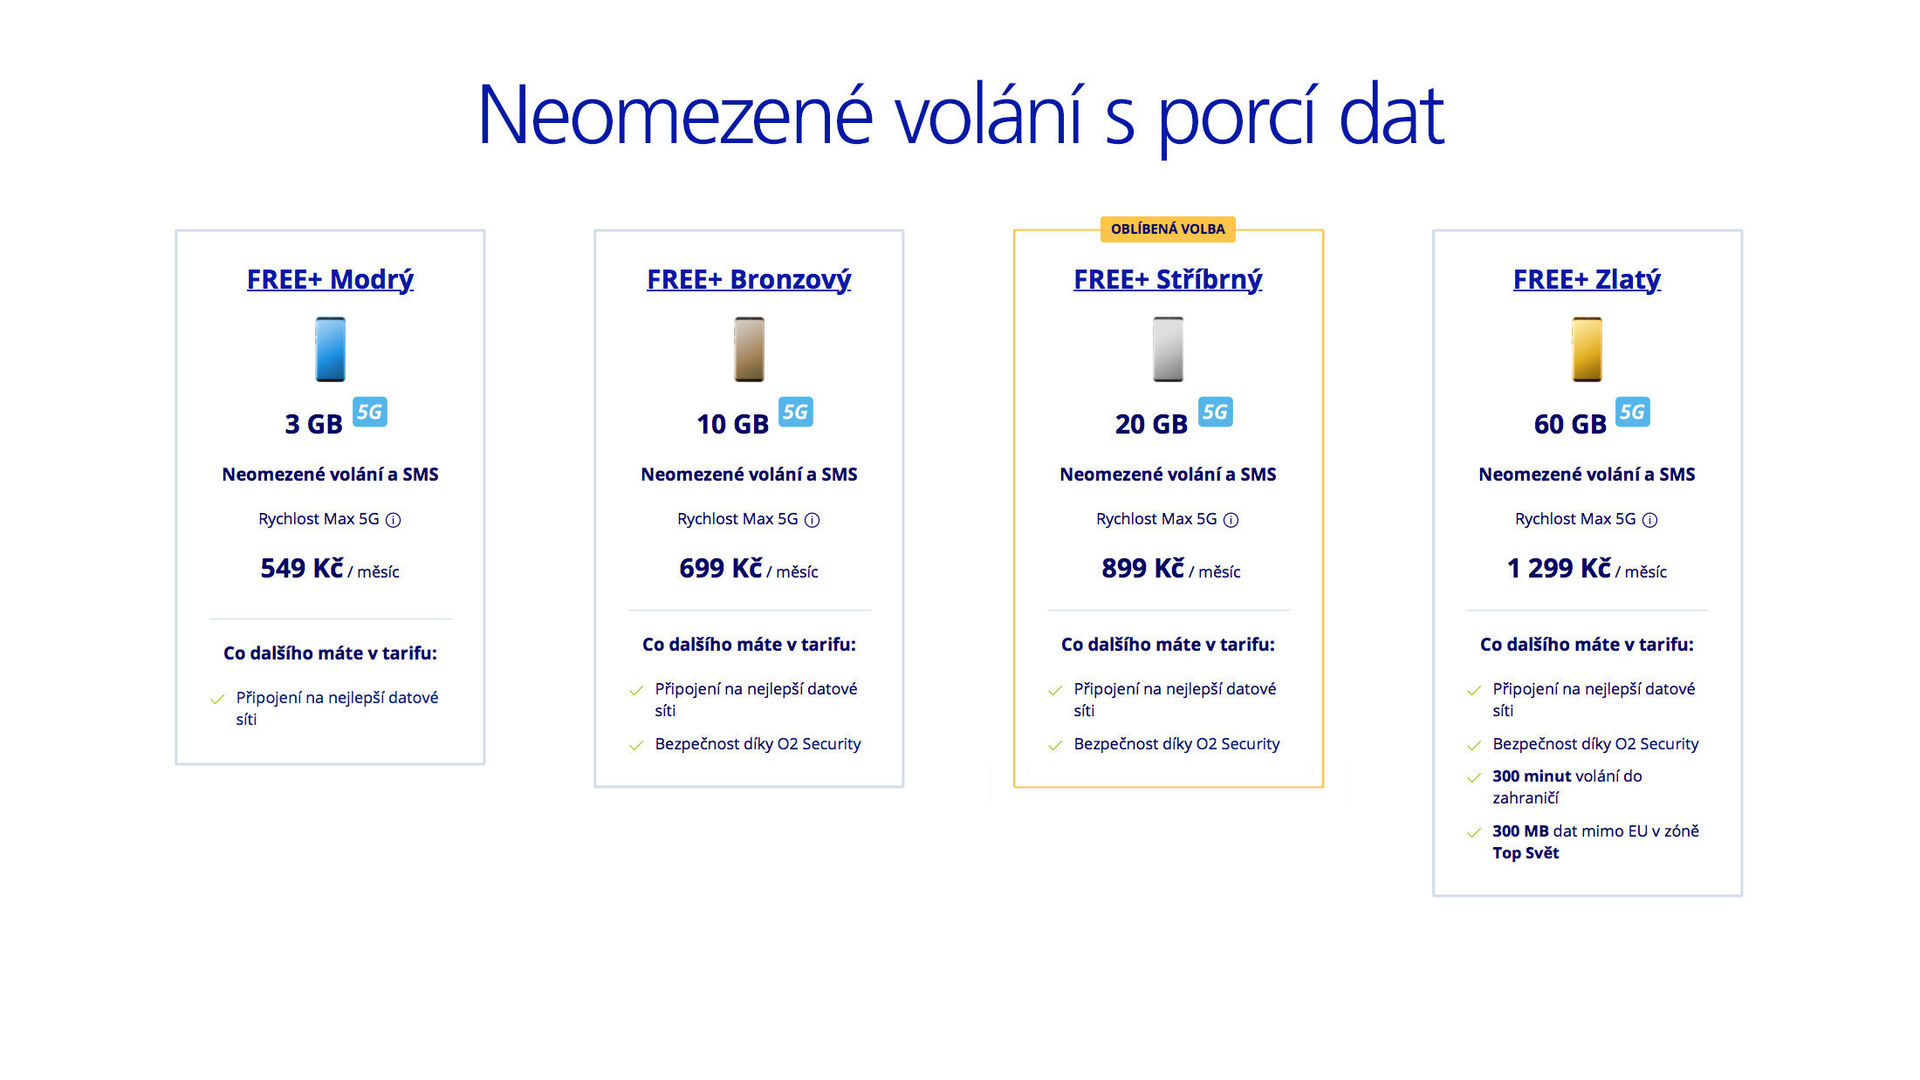 O2 tarify FREE+